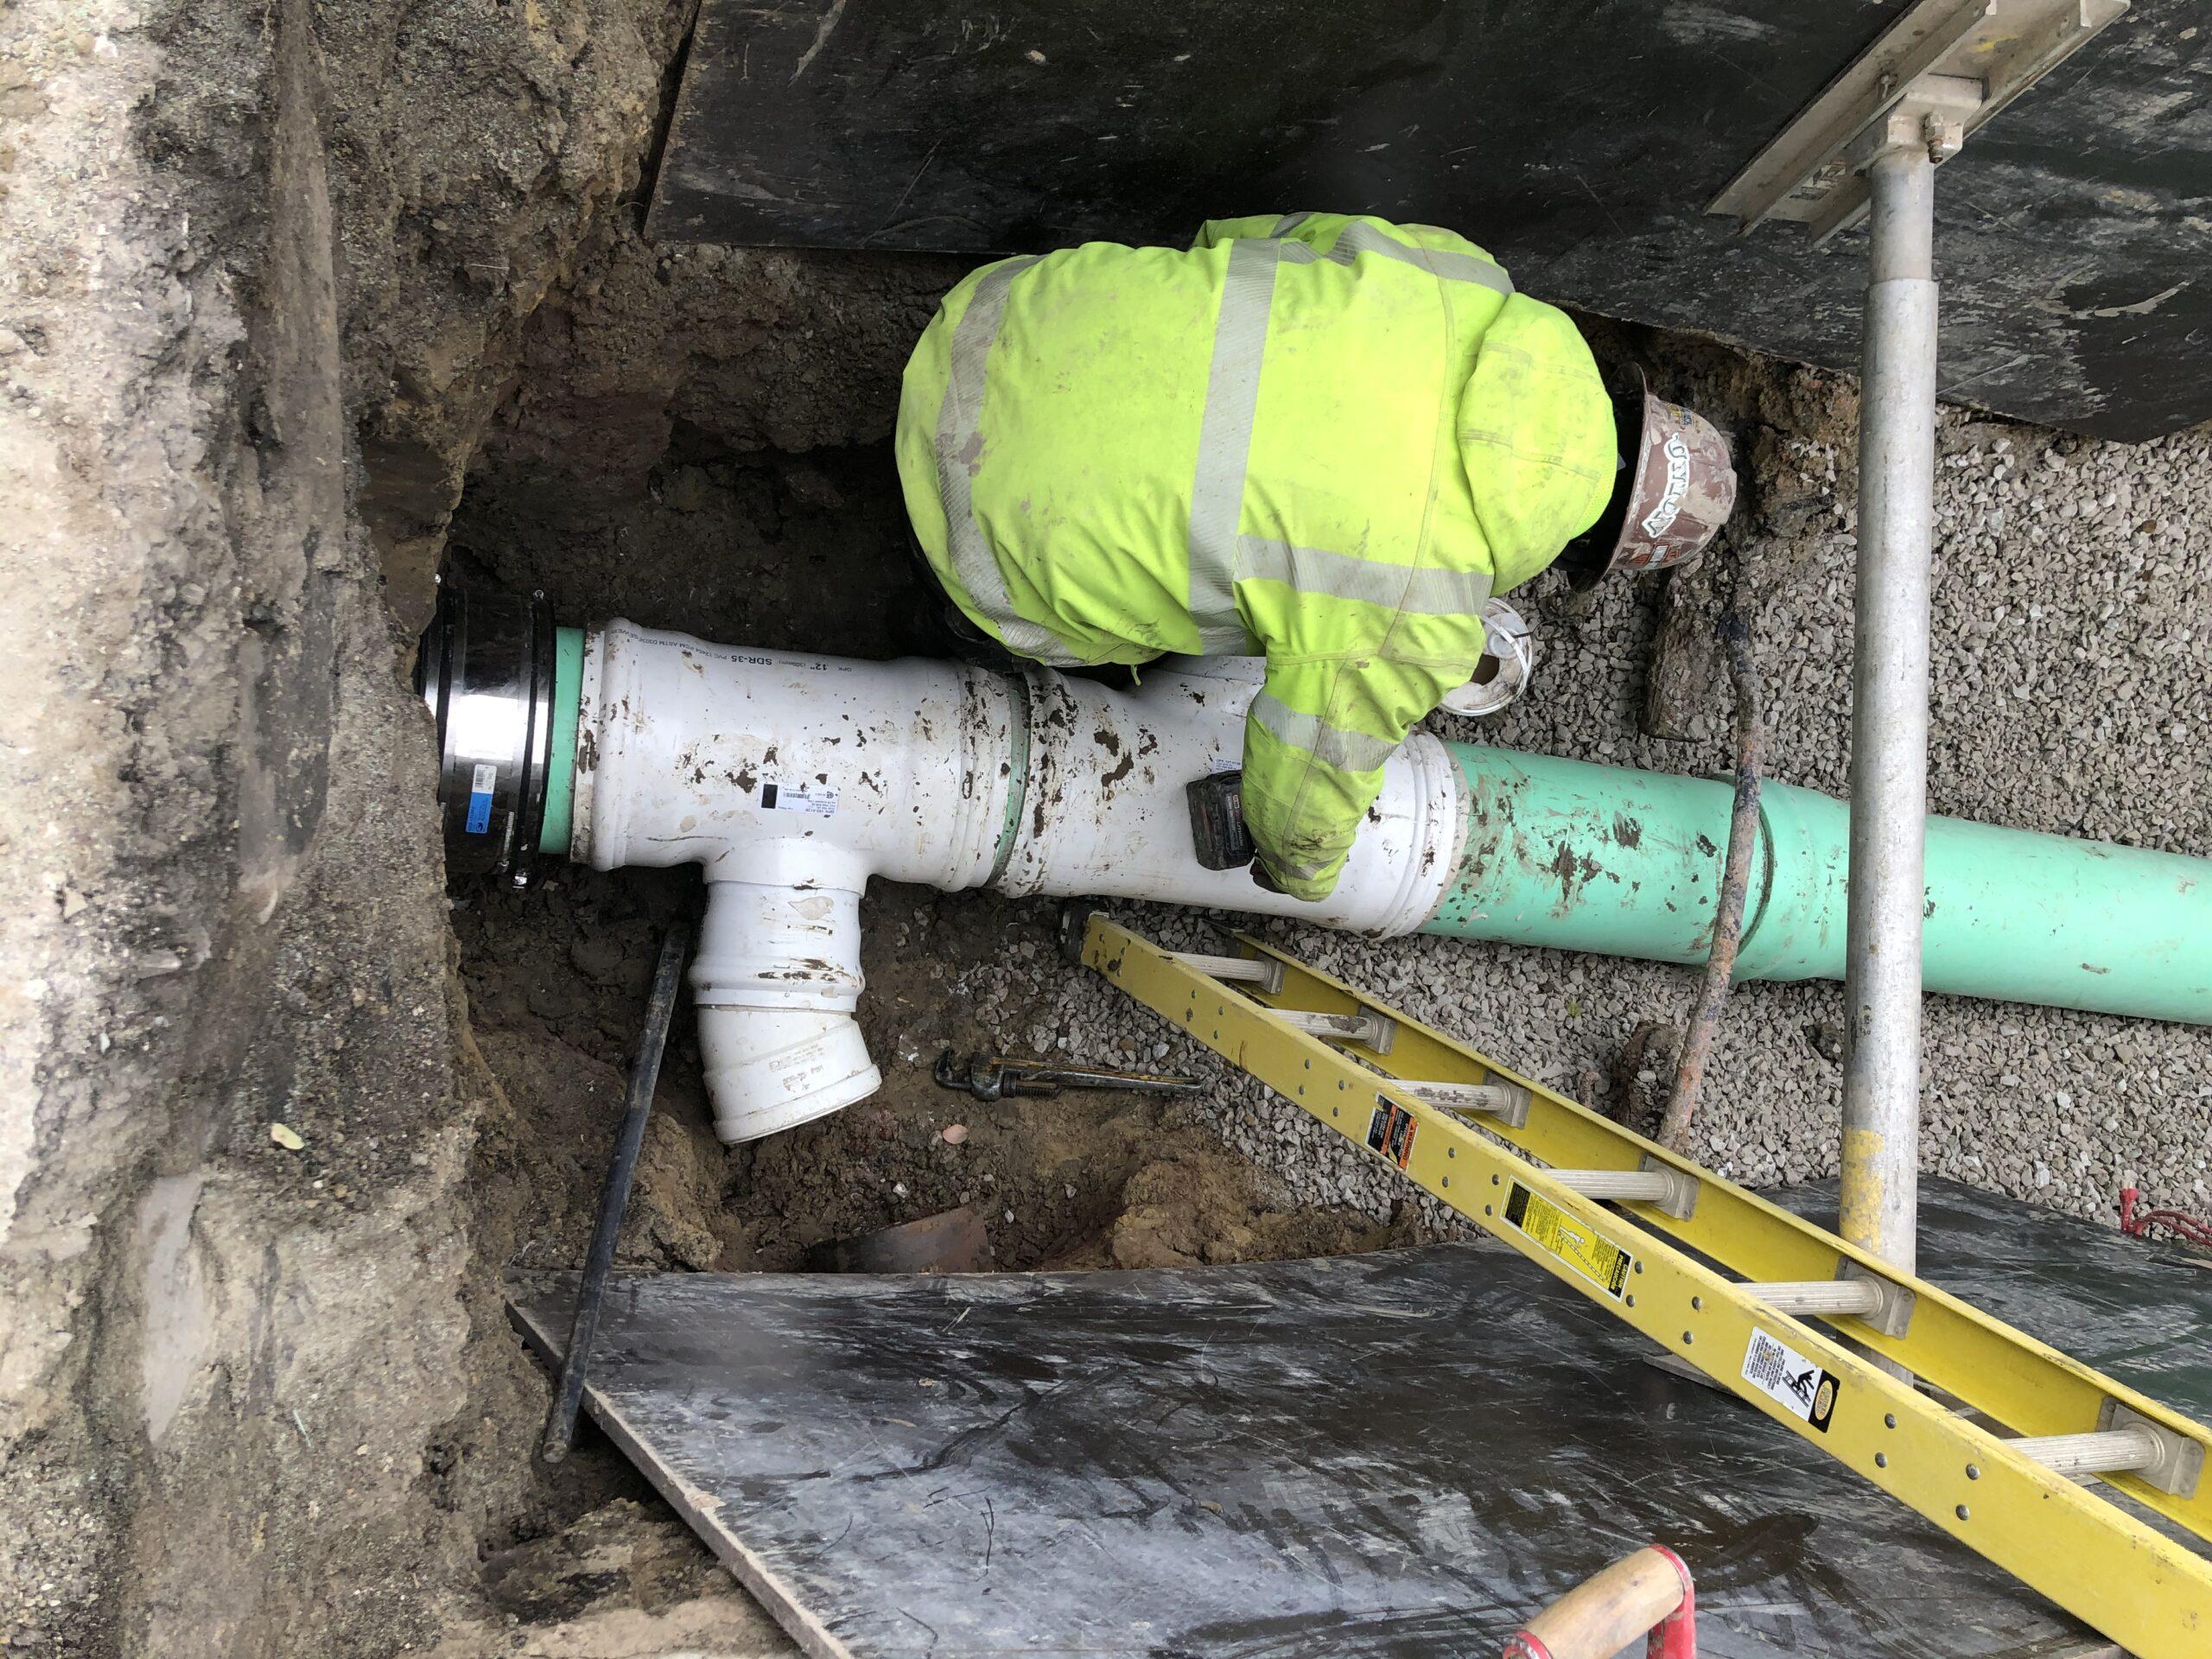 Sewer Repair Program - 12-inch Sewer Main Replacement